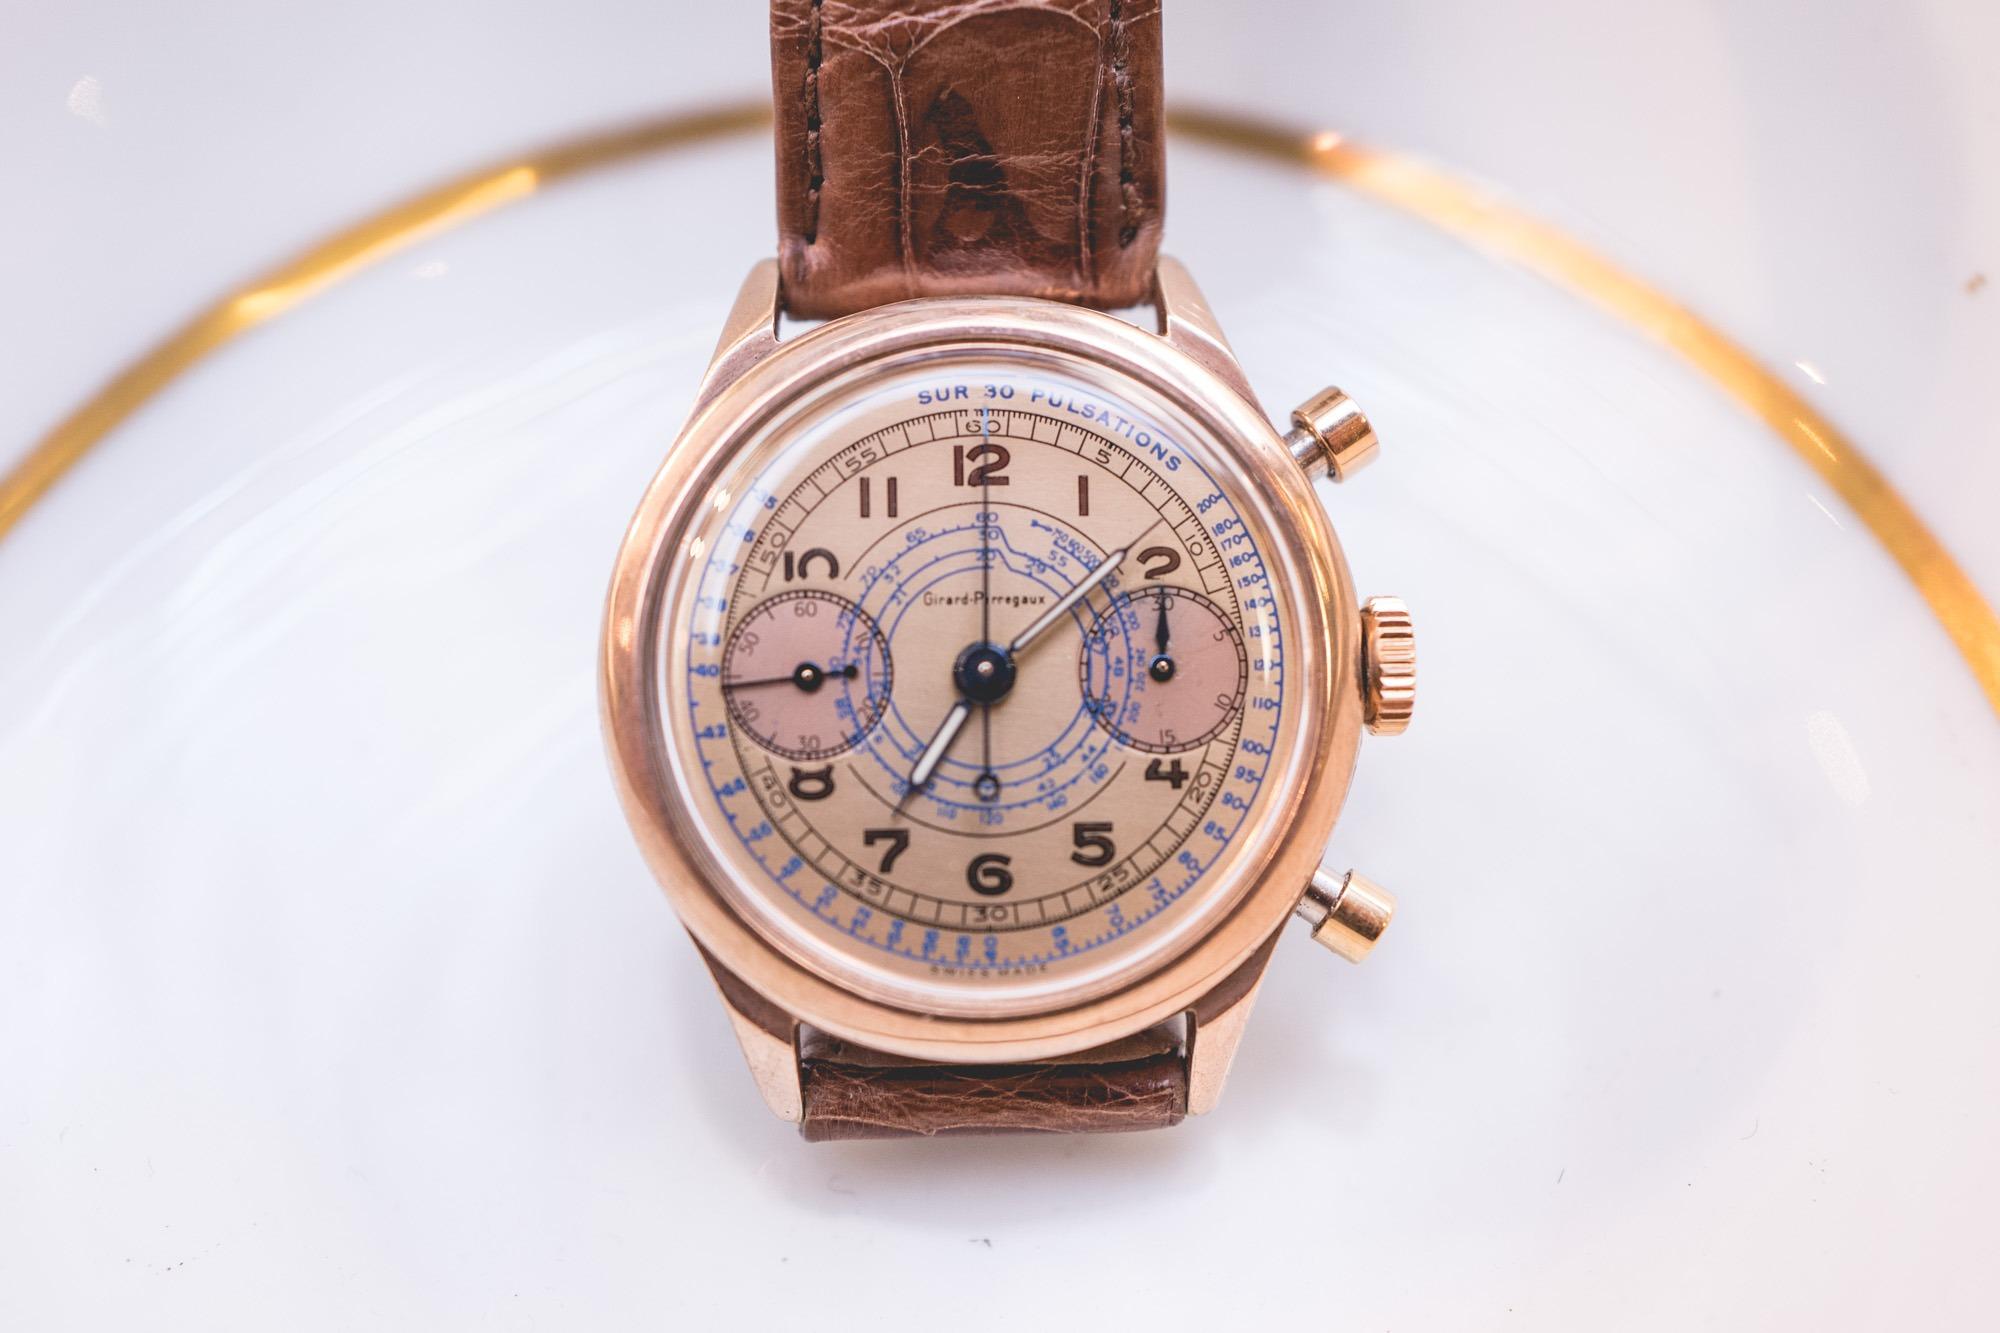 Vente Tajan Georg Fischer Girard Perregaux chronograph